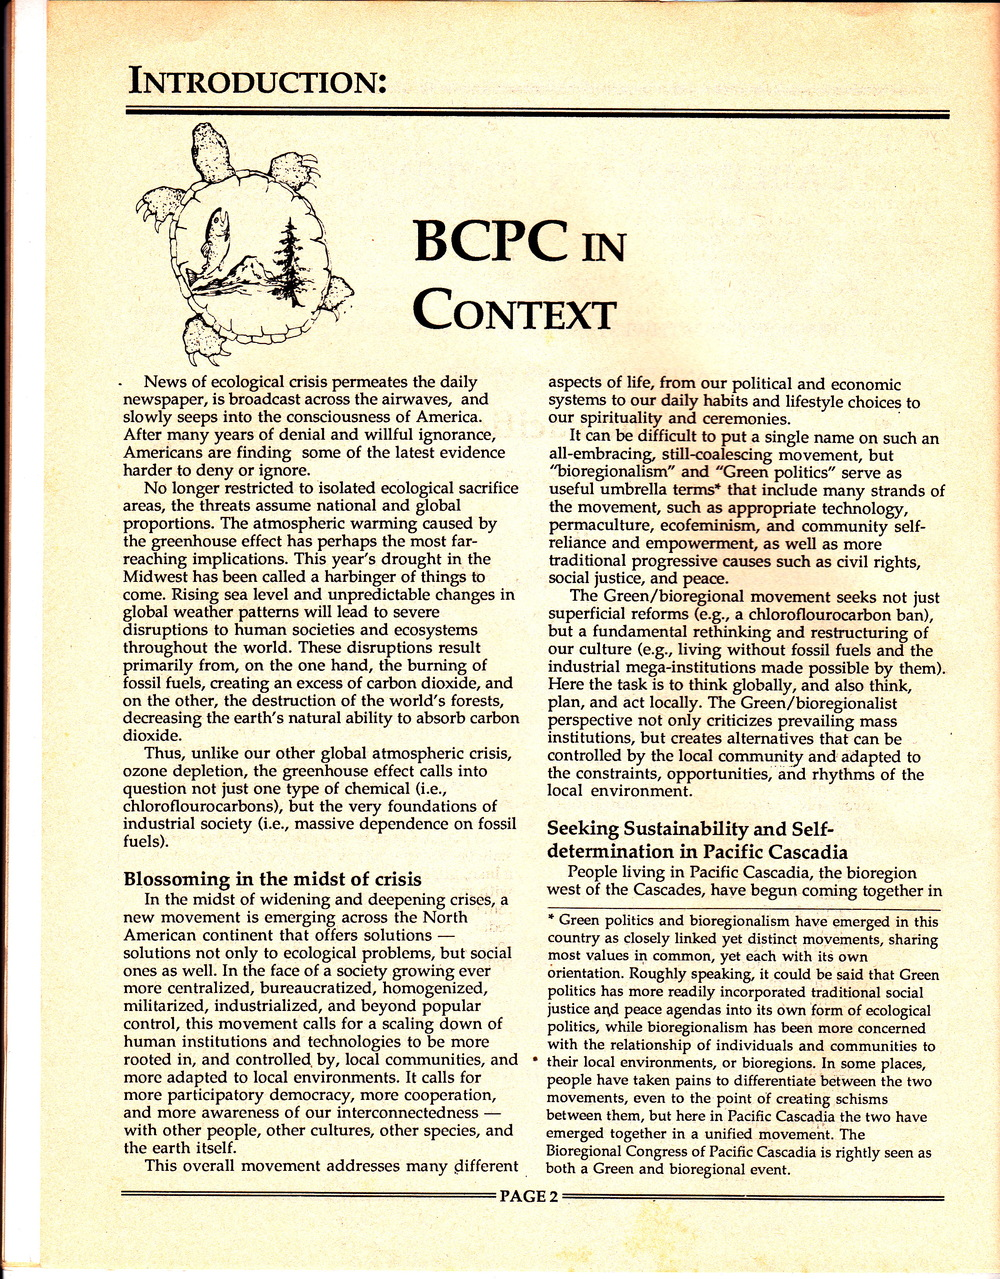 Cascadia Bioregional Congress 1986 Proceedings_0022.jpg